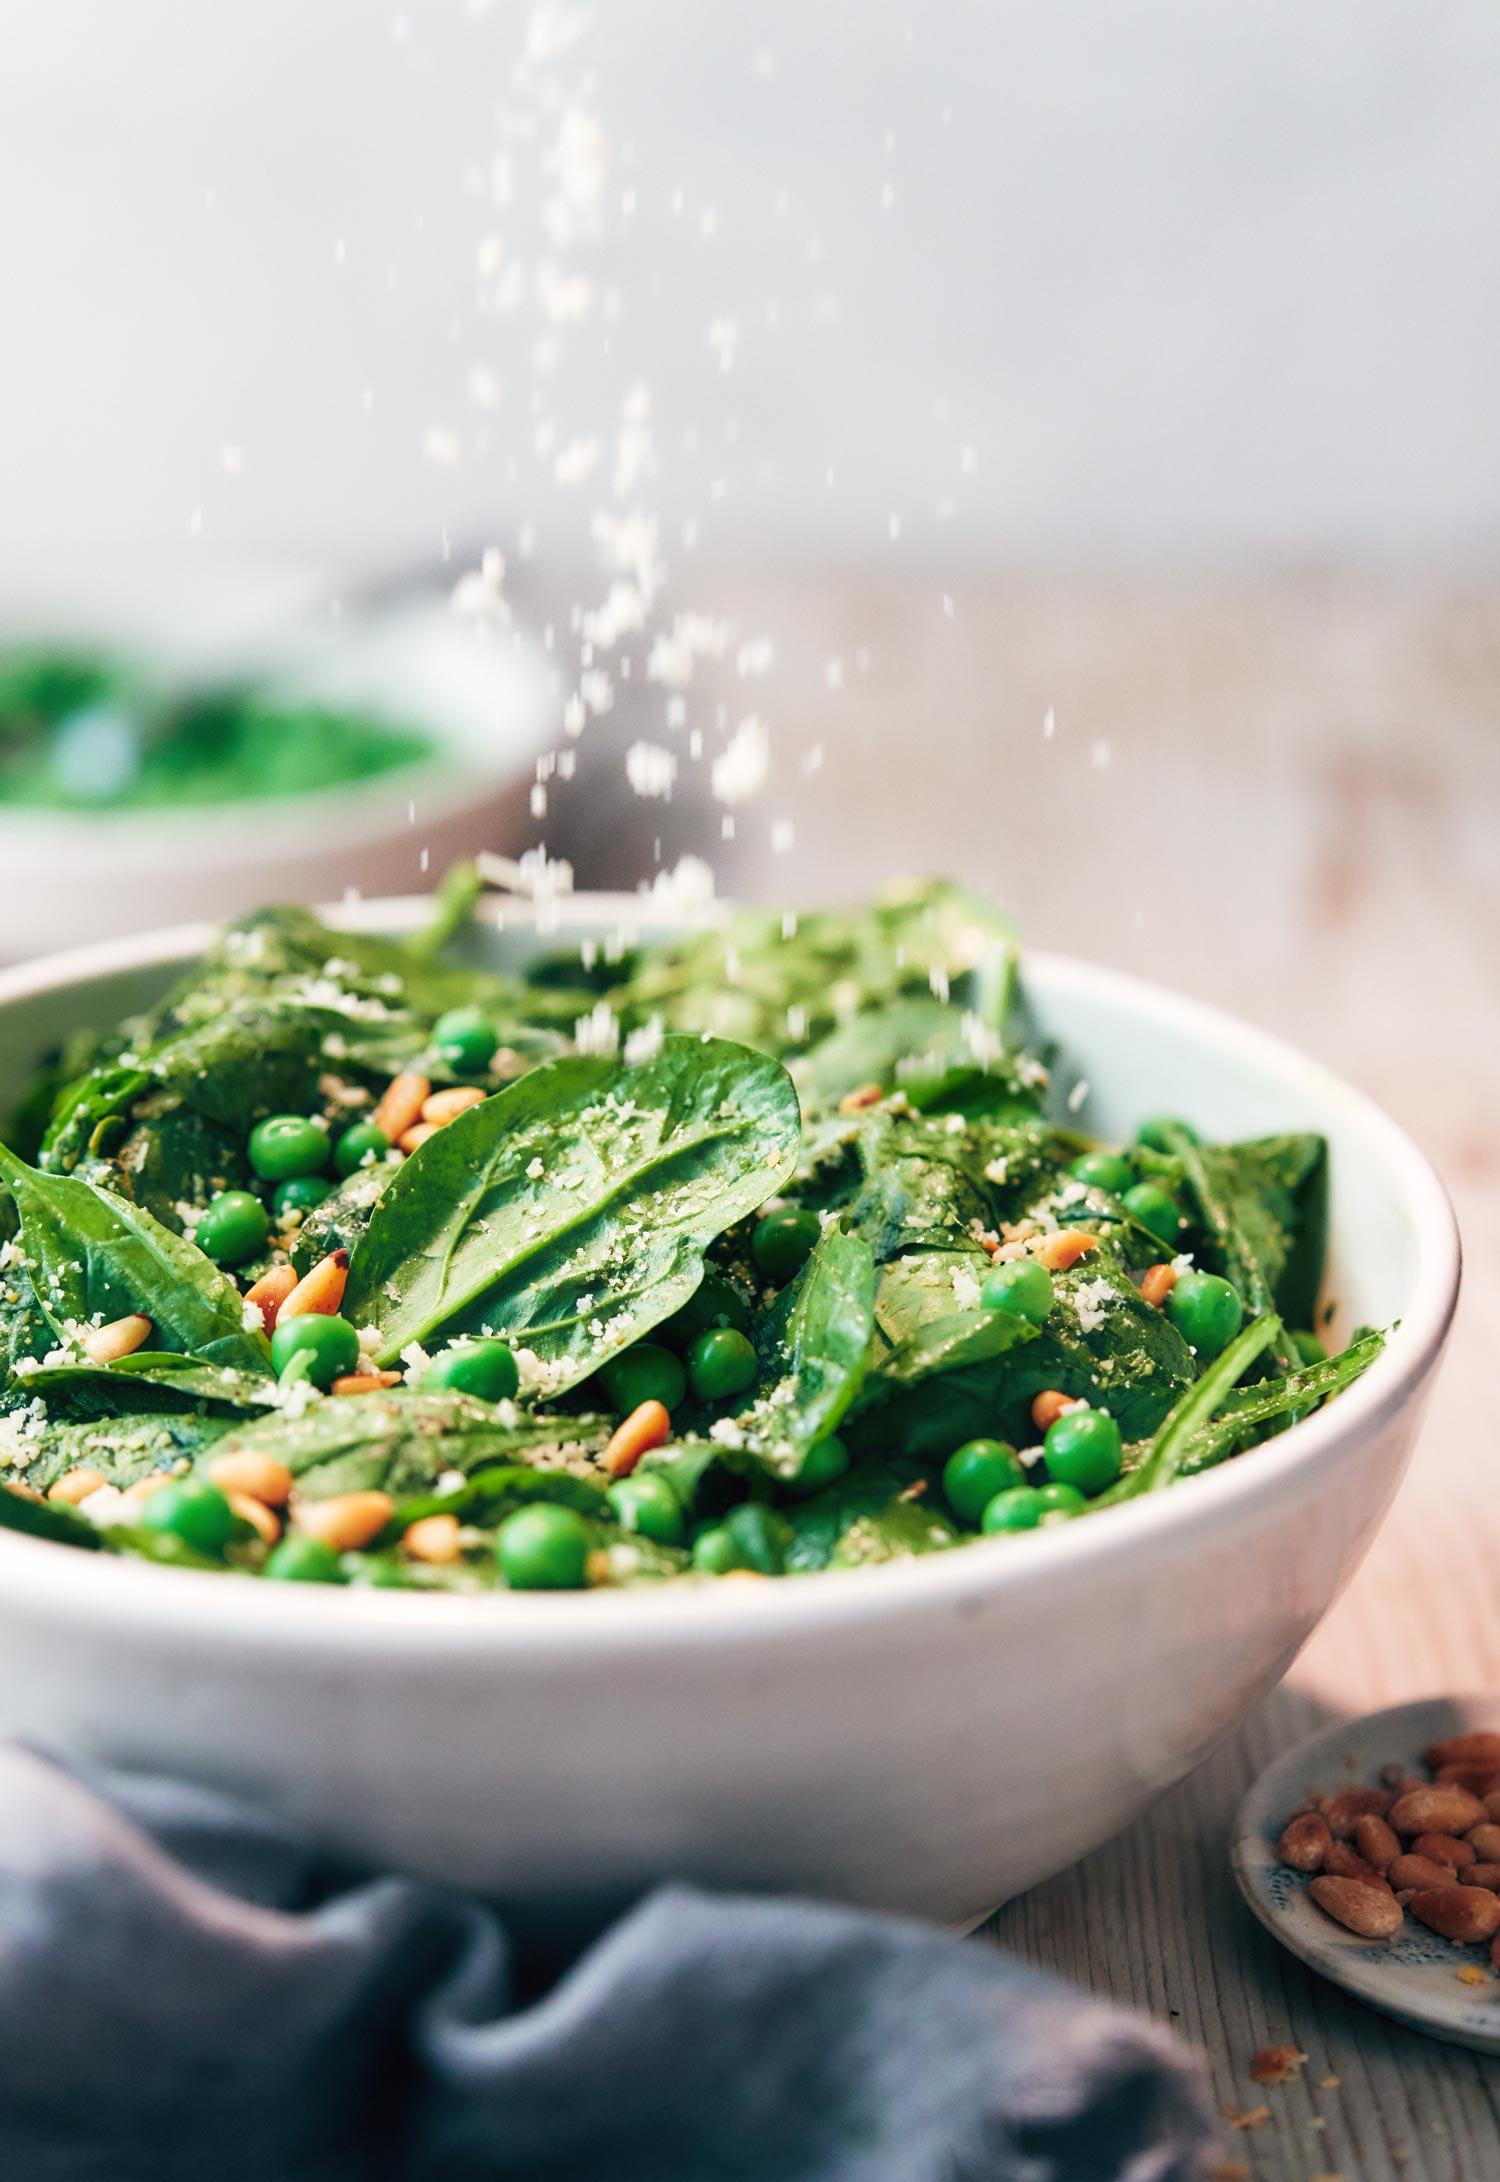 Pea & Pesto Spinach Salad | Evergreen Kitchen | Gluten Free, Vegan (option)